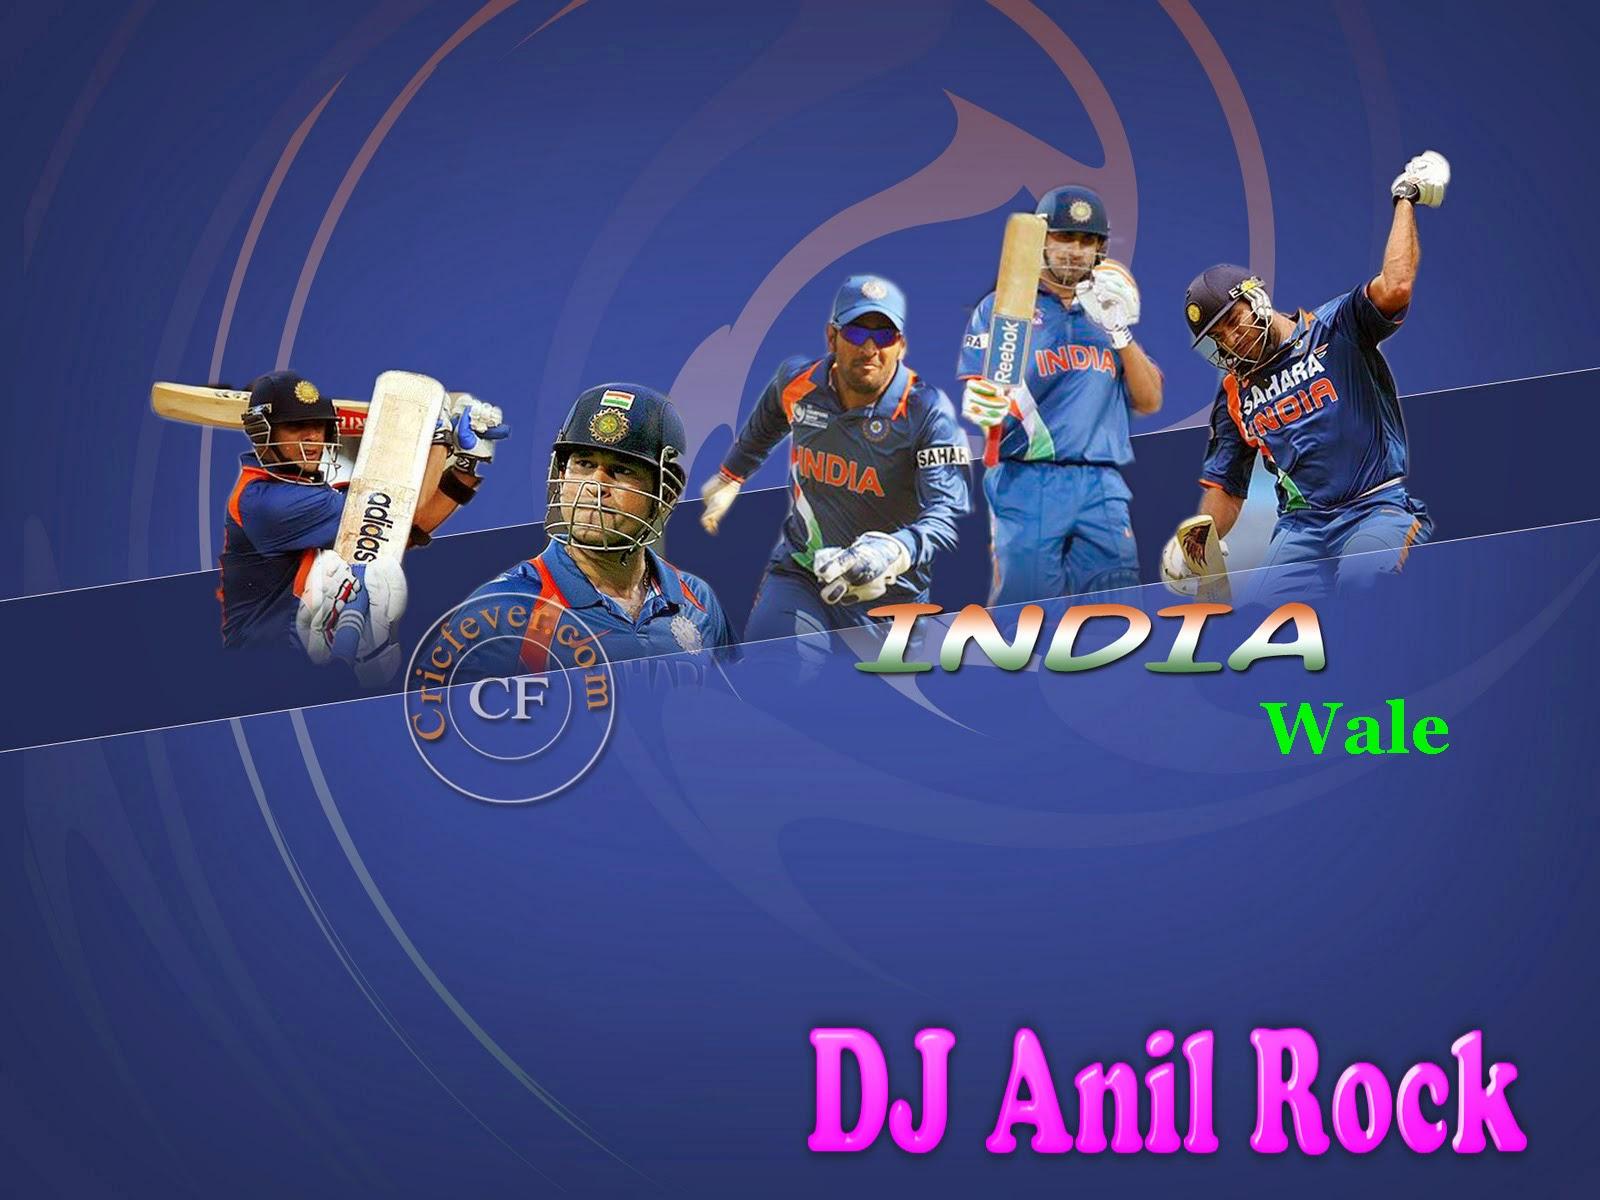 india wale DJ Anil Rock ~ Dj Anil Rock -- 9125917720 -- Mahoba